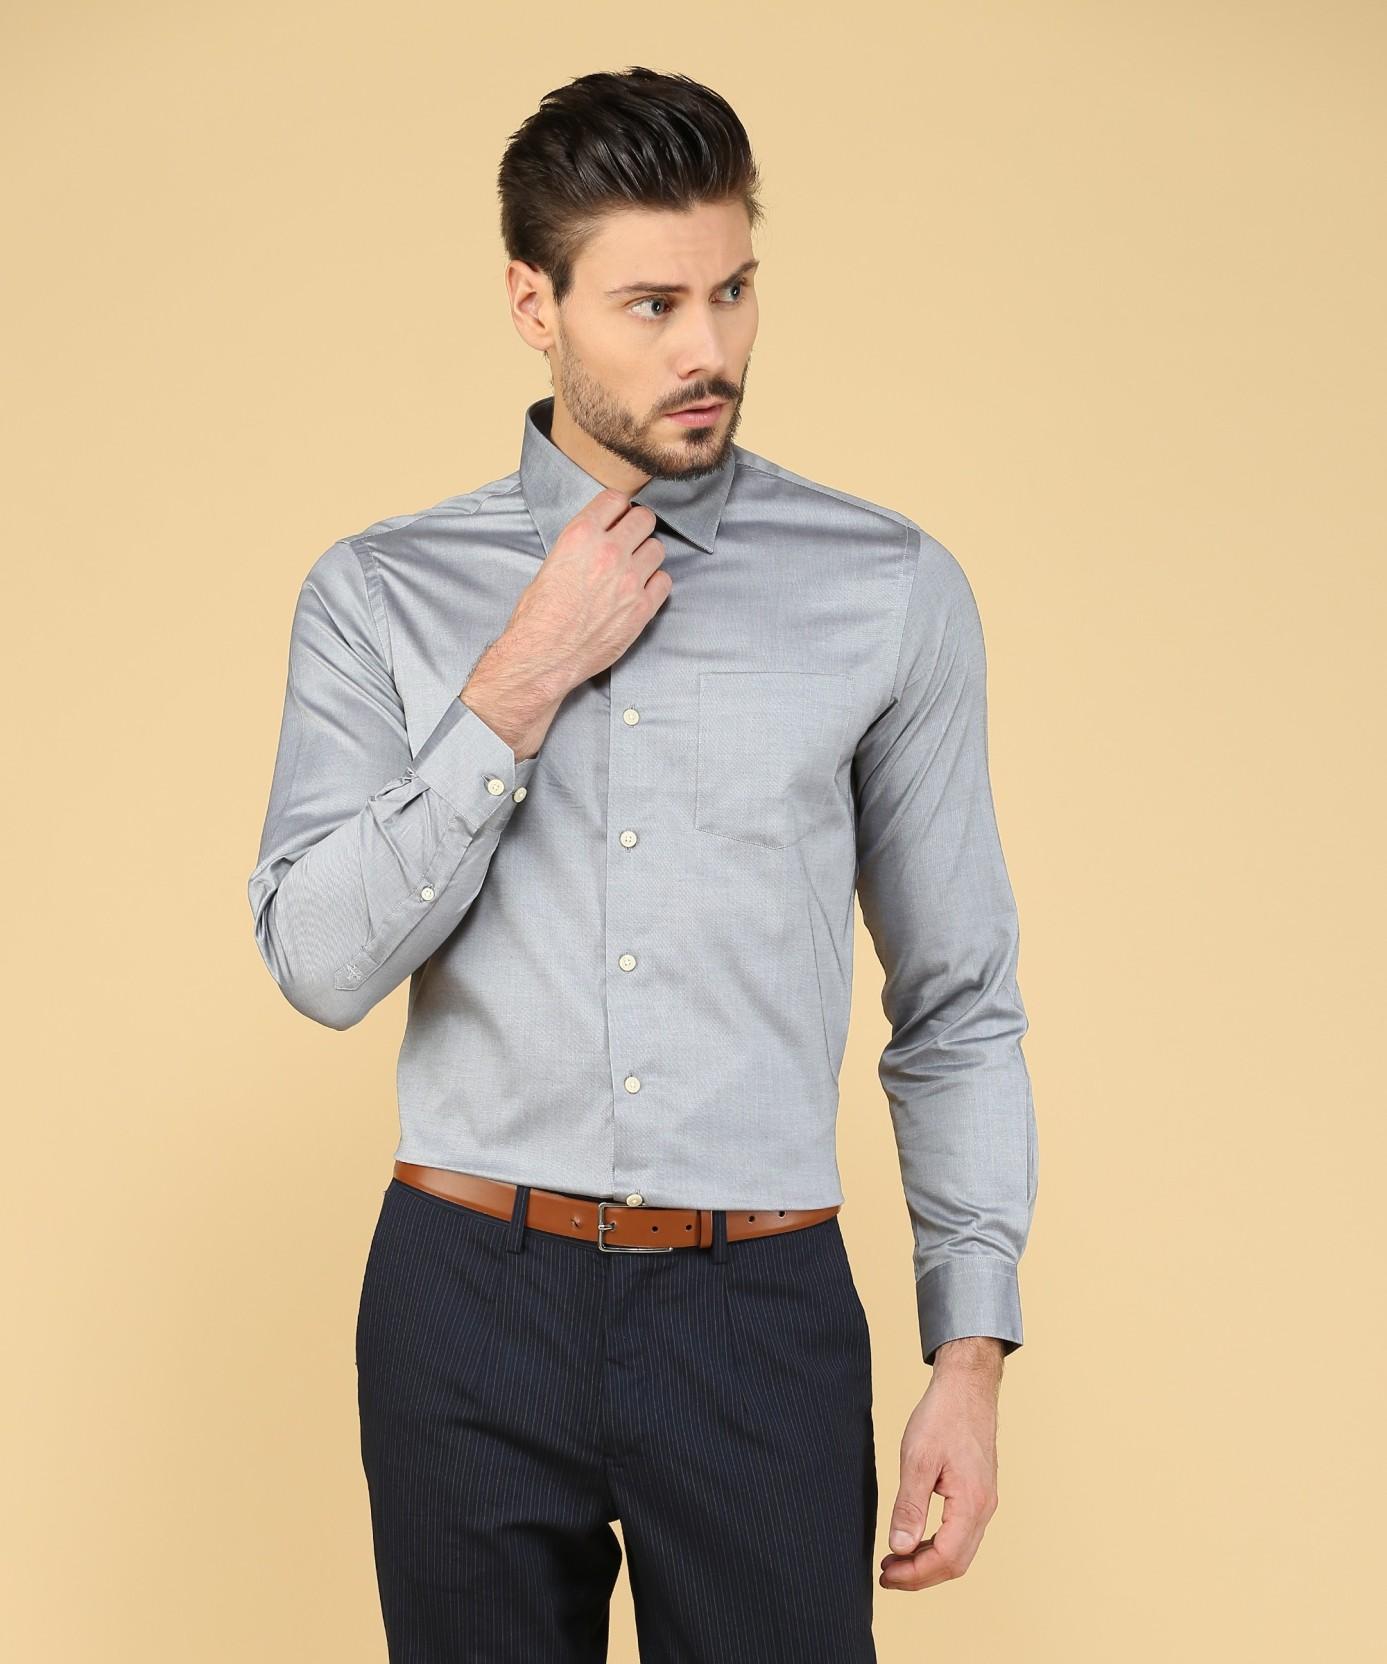 Arrow Formal Shirts India Rockwall Auction